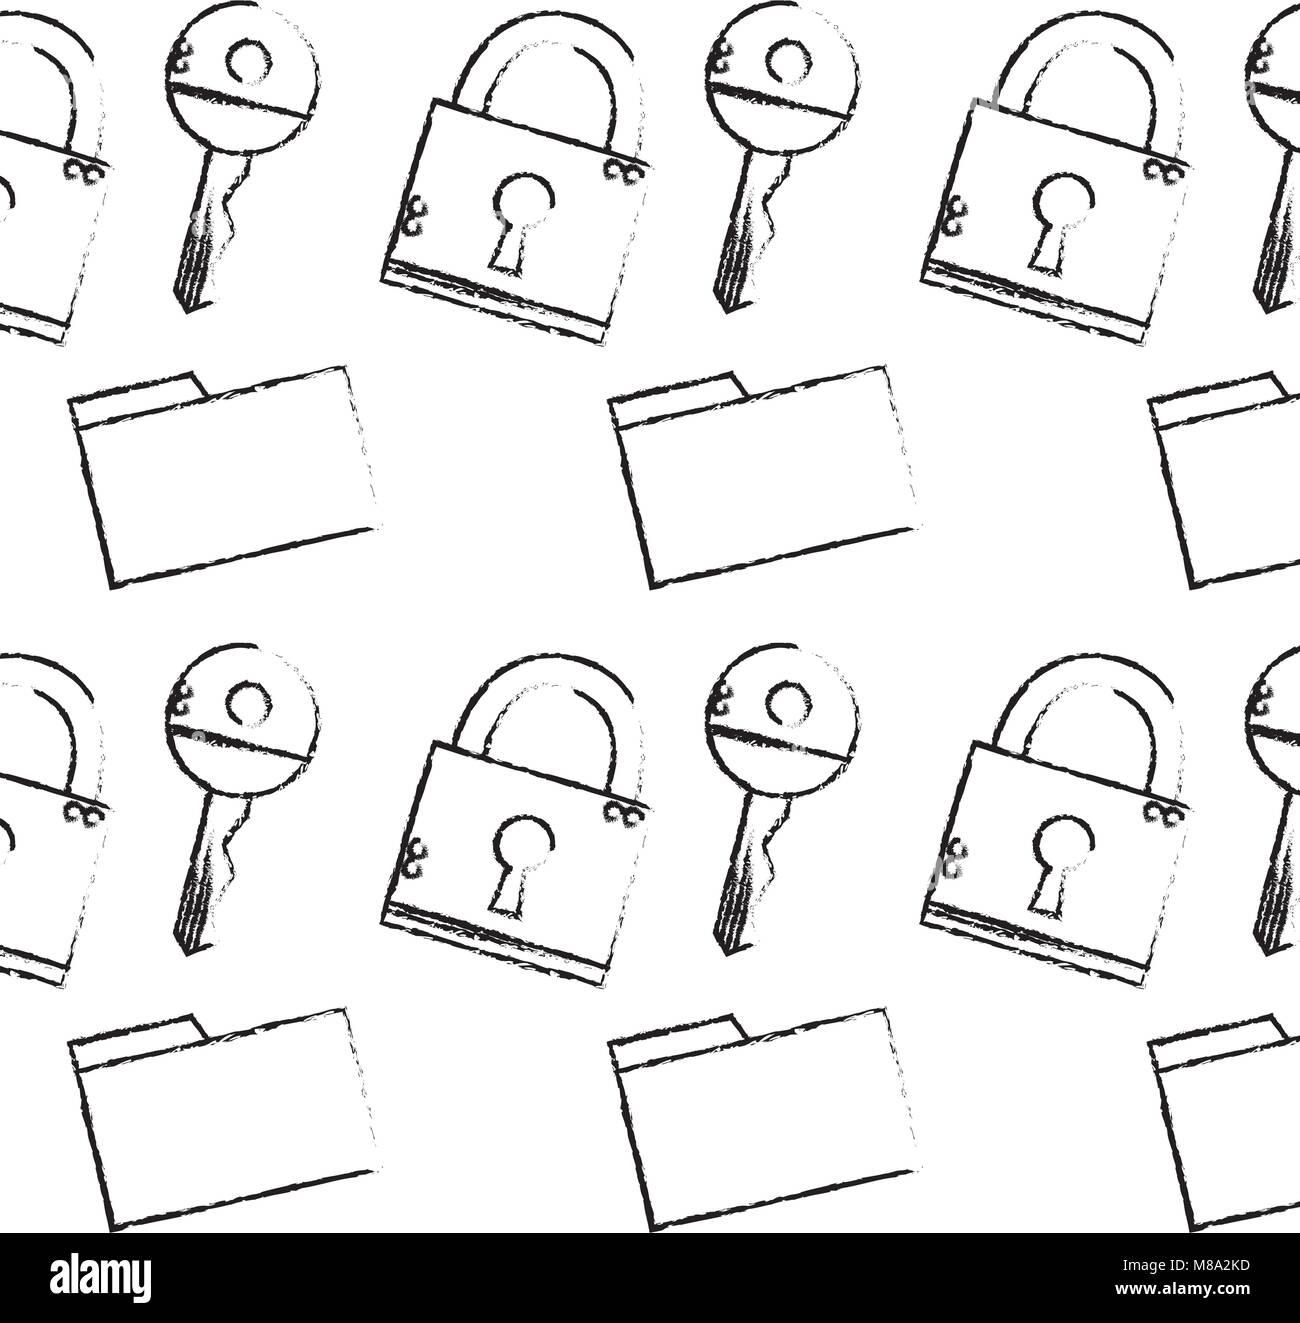 grunge close padlock security and file folder background - Stock Image